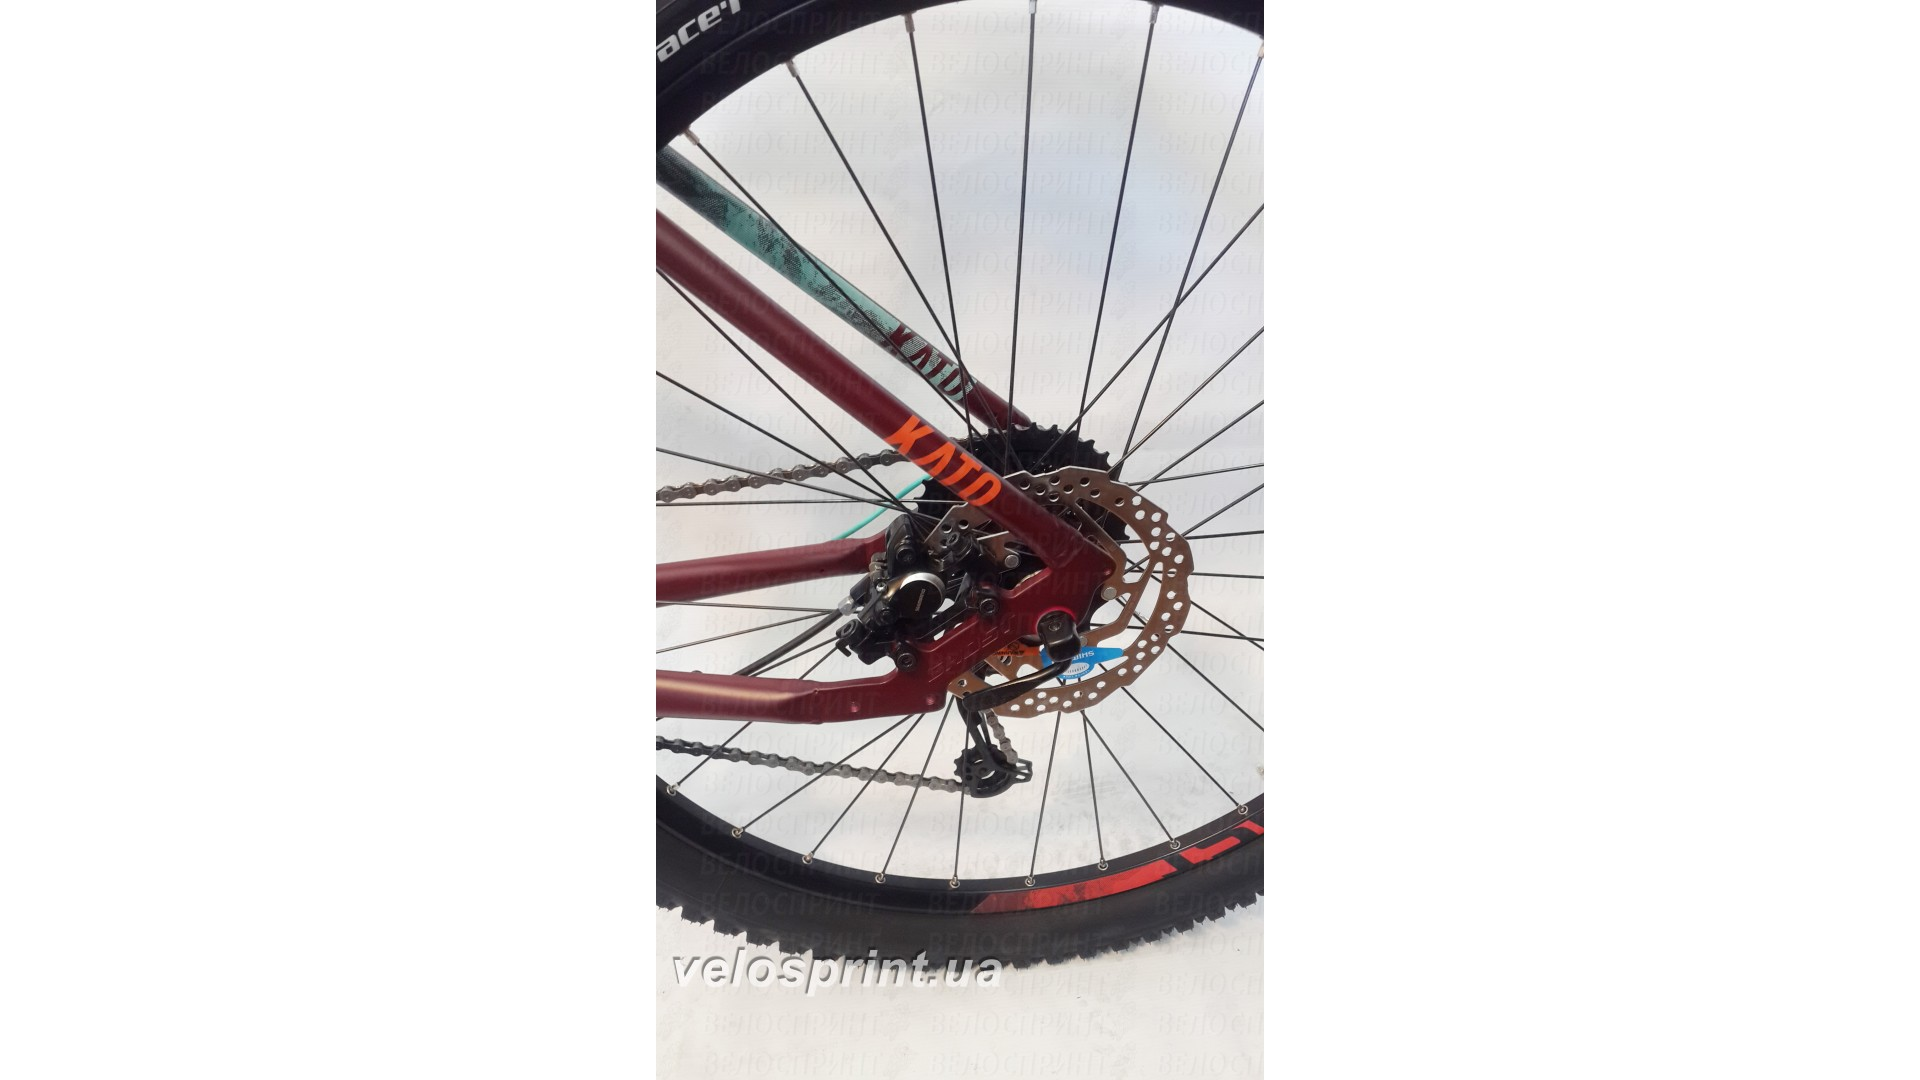 Велосипед GHOST Kato 3 AL 29 marsalared/cranberryred/jadeblue задний тормоз год 2017